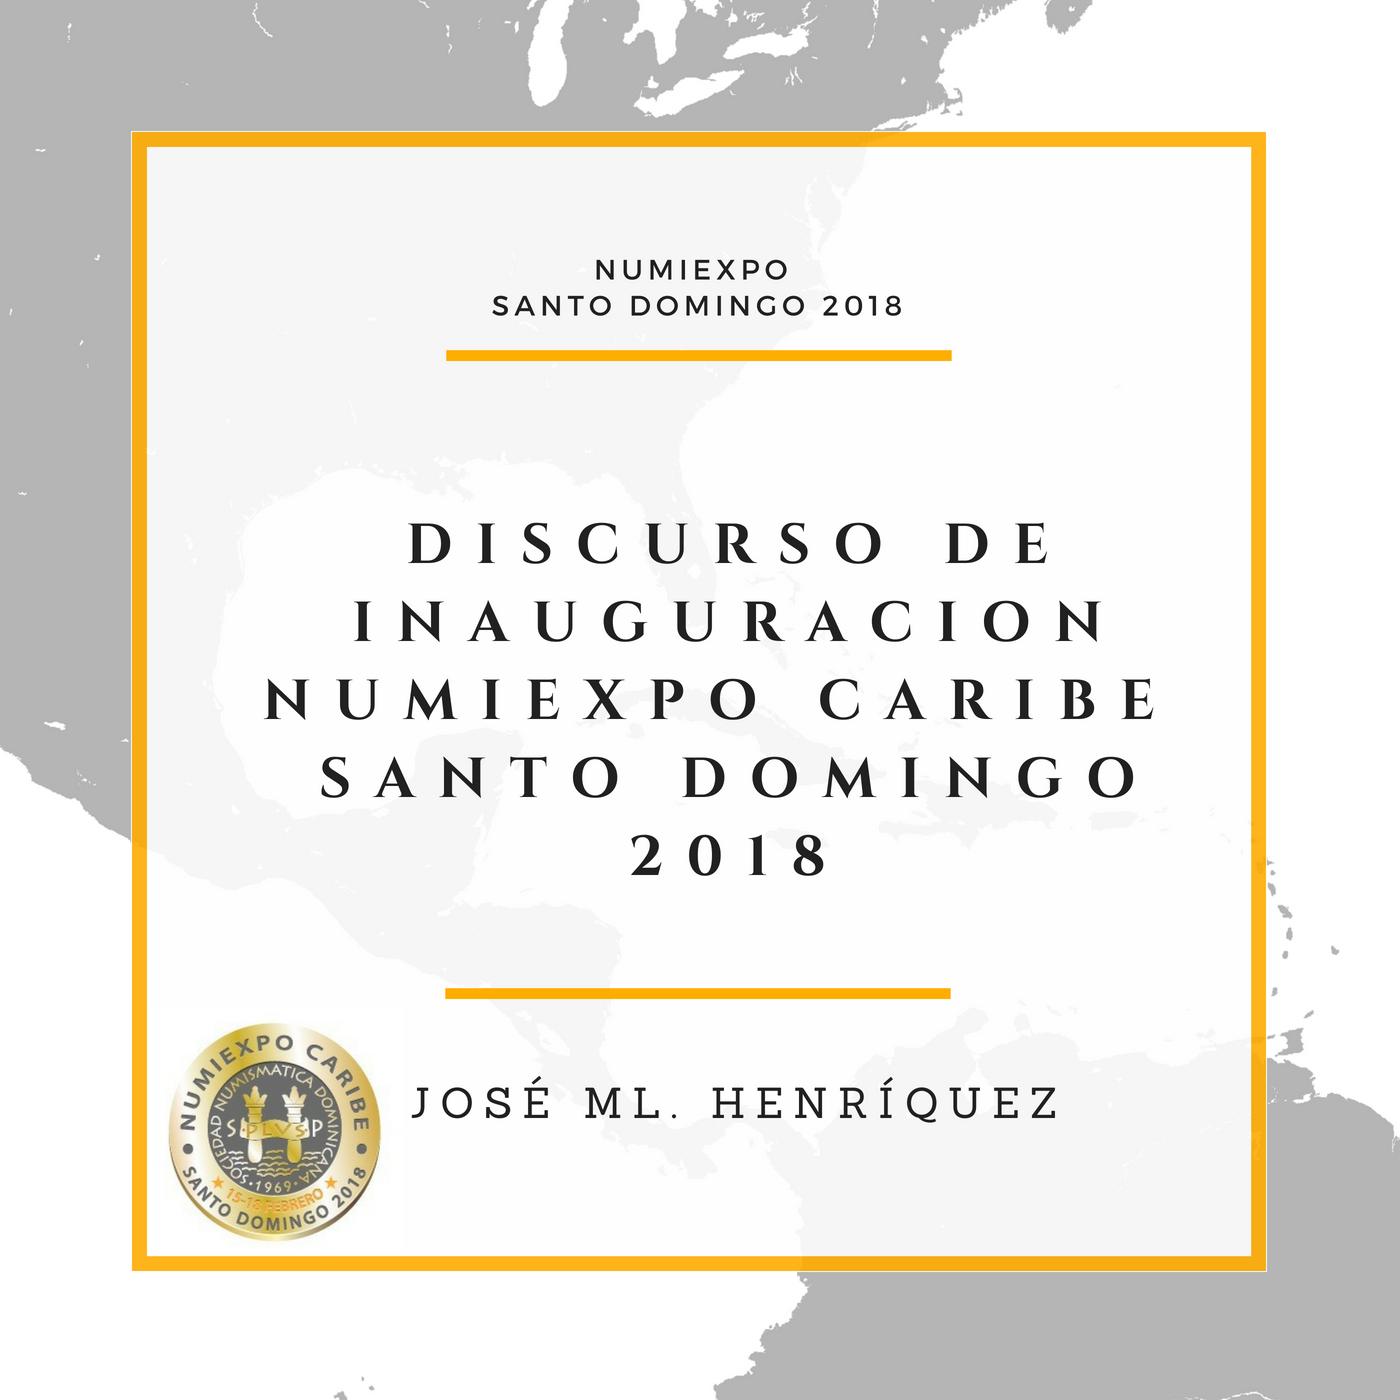 Discurso Apertura Numiexpo 2017. Jose Manuel Henriques Soñe